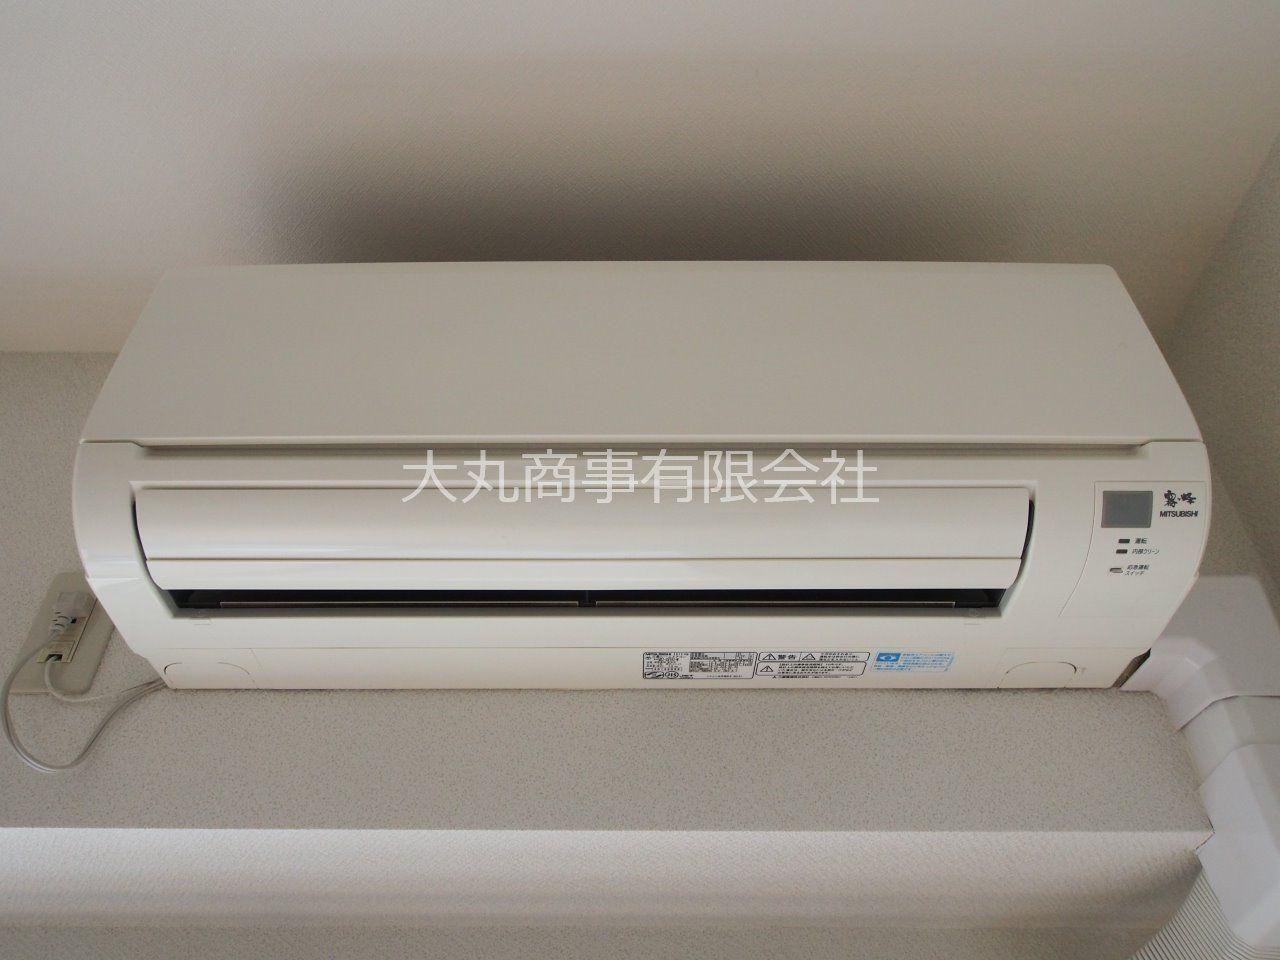 三菱 霧ヶ峰(2012年製)、MSZ-GV282-W